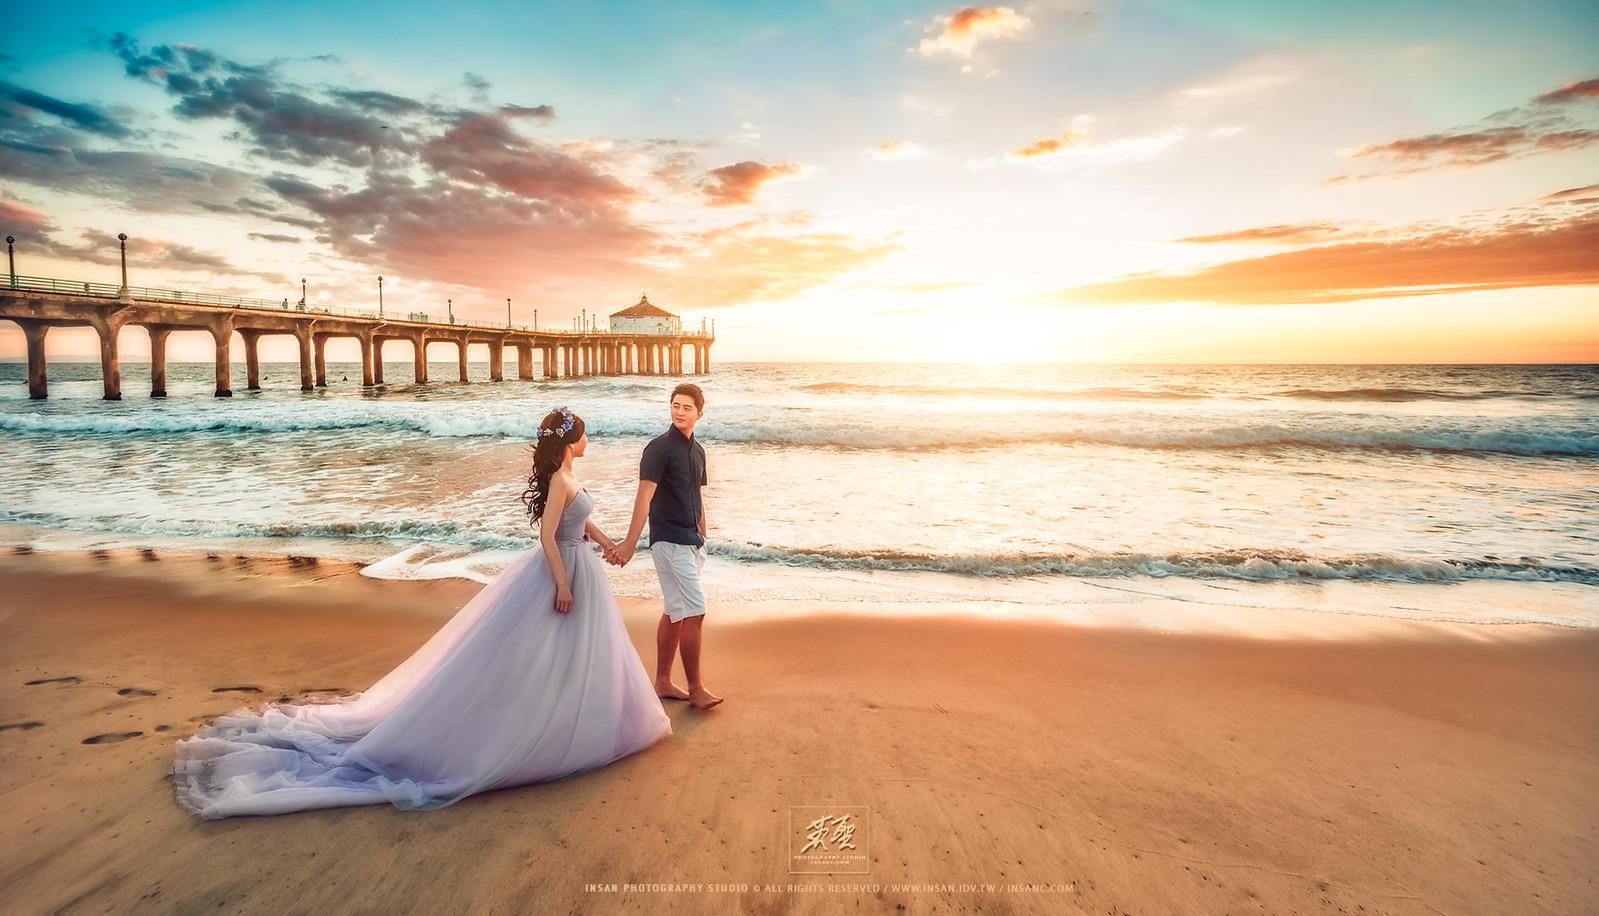 LA洛杉磯婚紗_婚攝英聖photo-20161025090526-2 -1920 拷貝